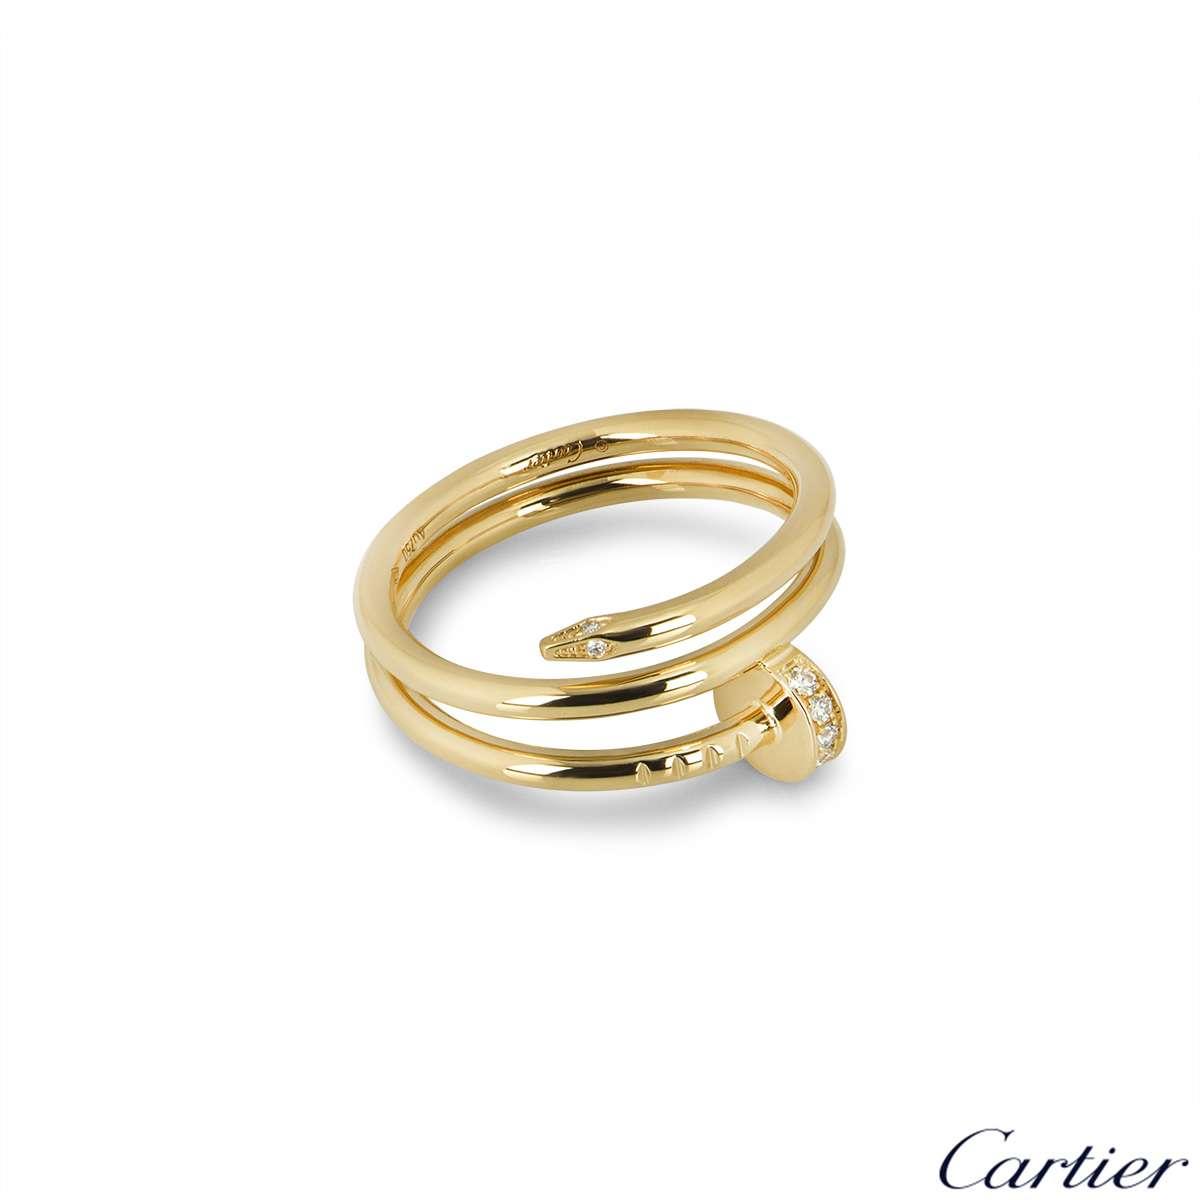 Cartier Yellow Gold Diamond Juste Un Clou Ring Size 53 B4211800